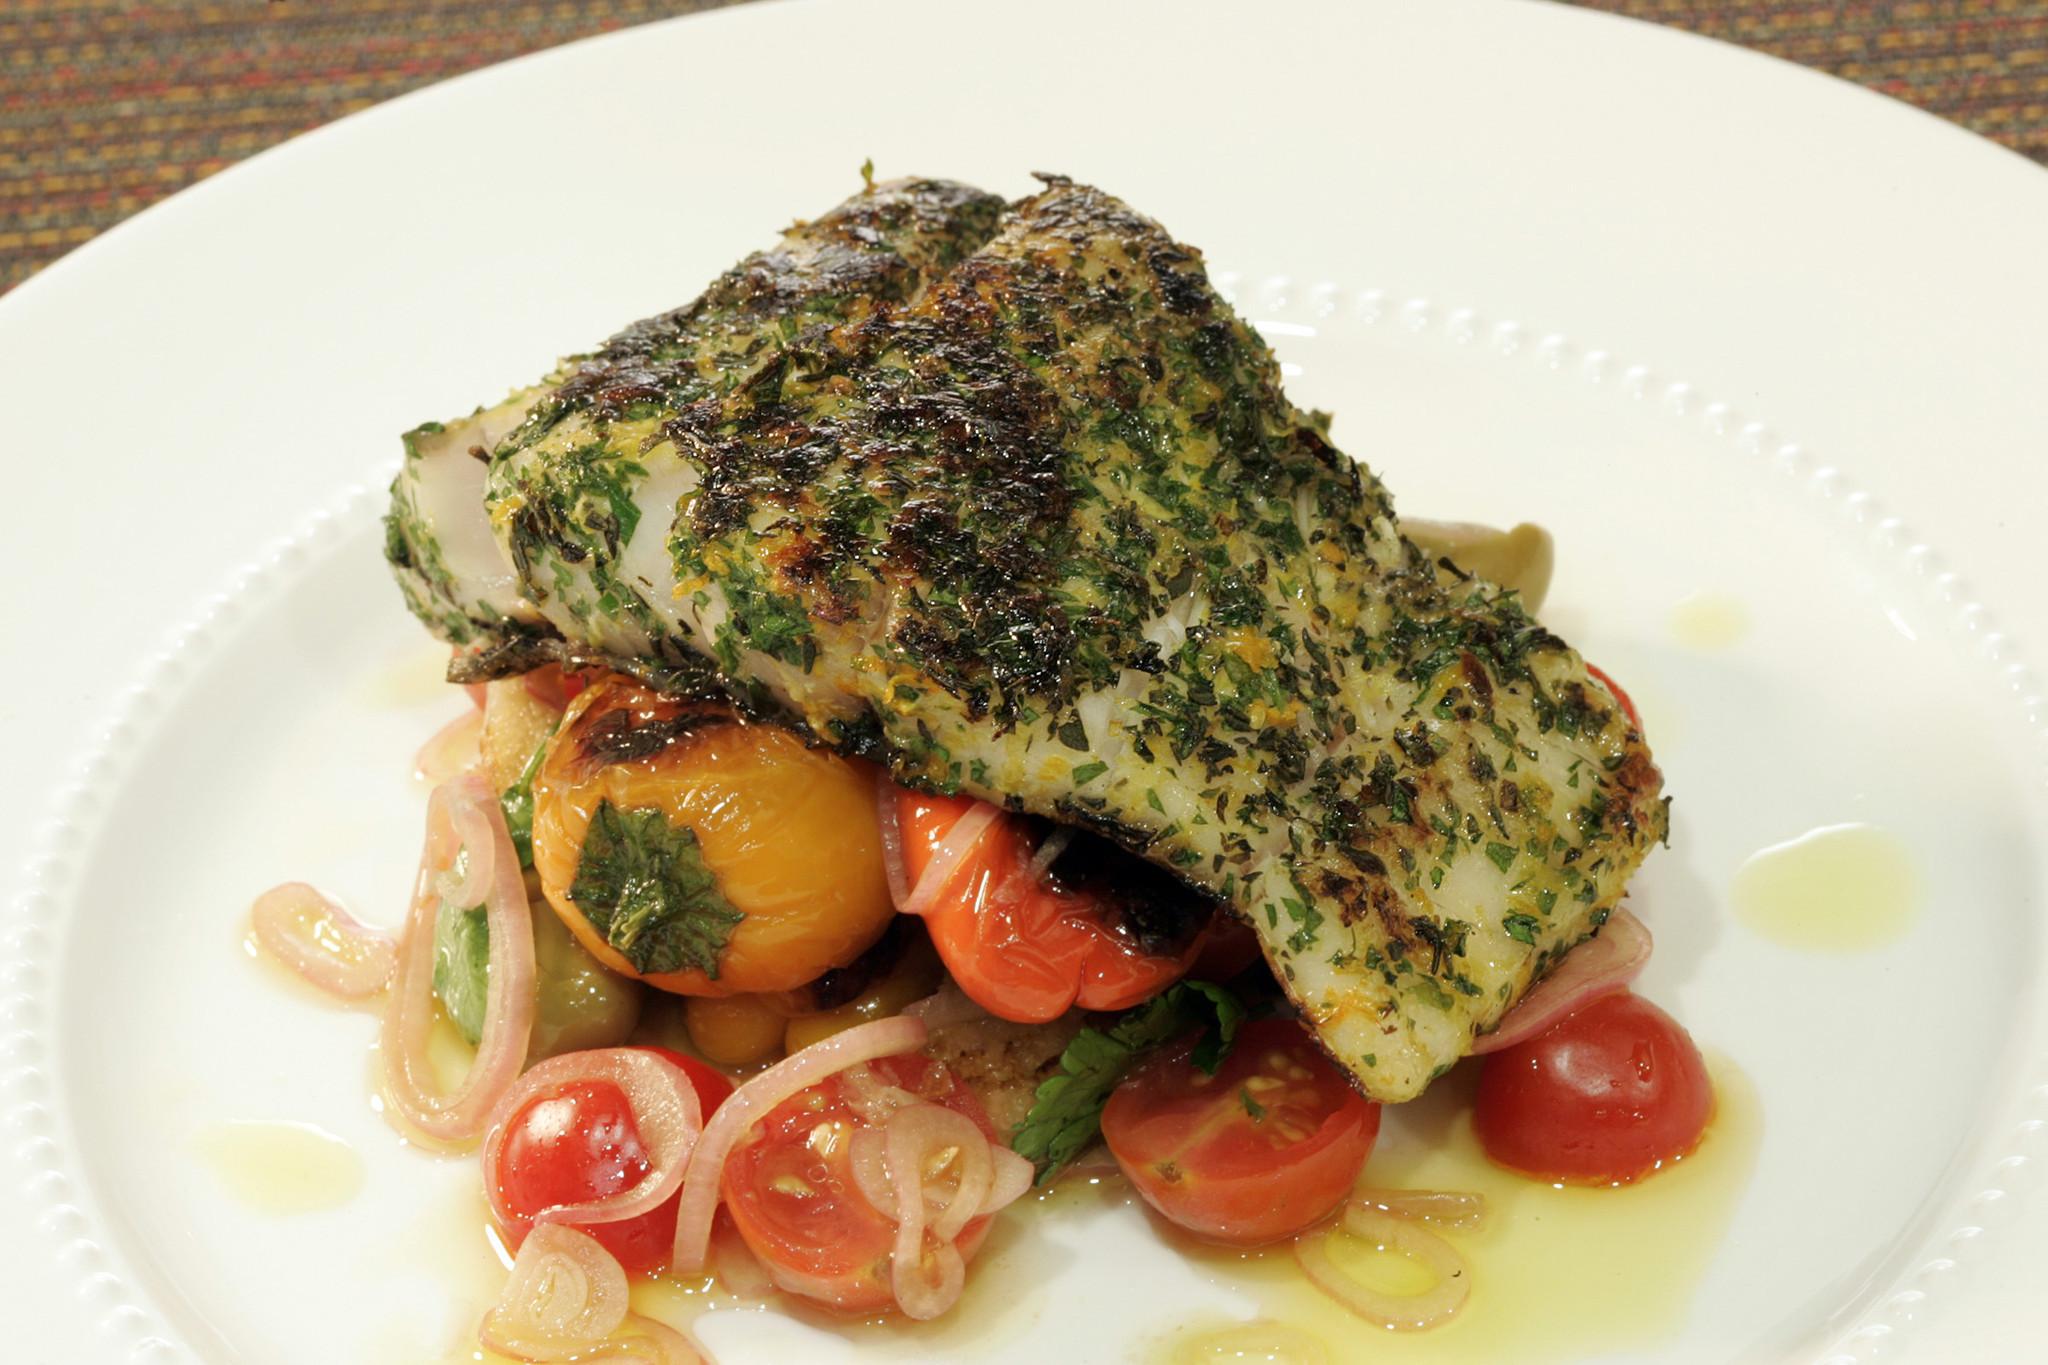 Fish Dinner Recipes  Easy dinner recipes Snapper swordfish and more fish